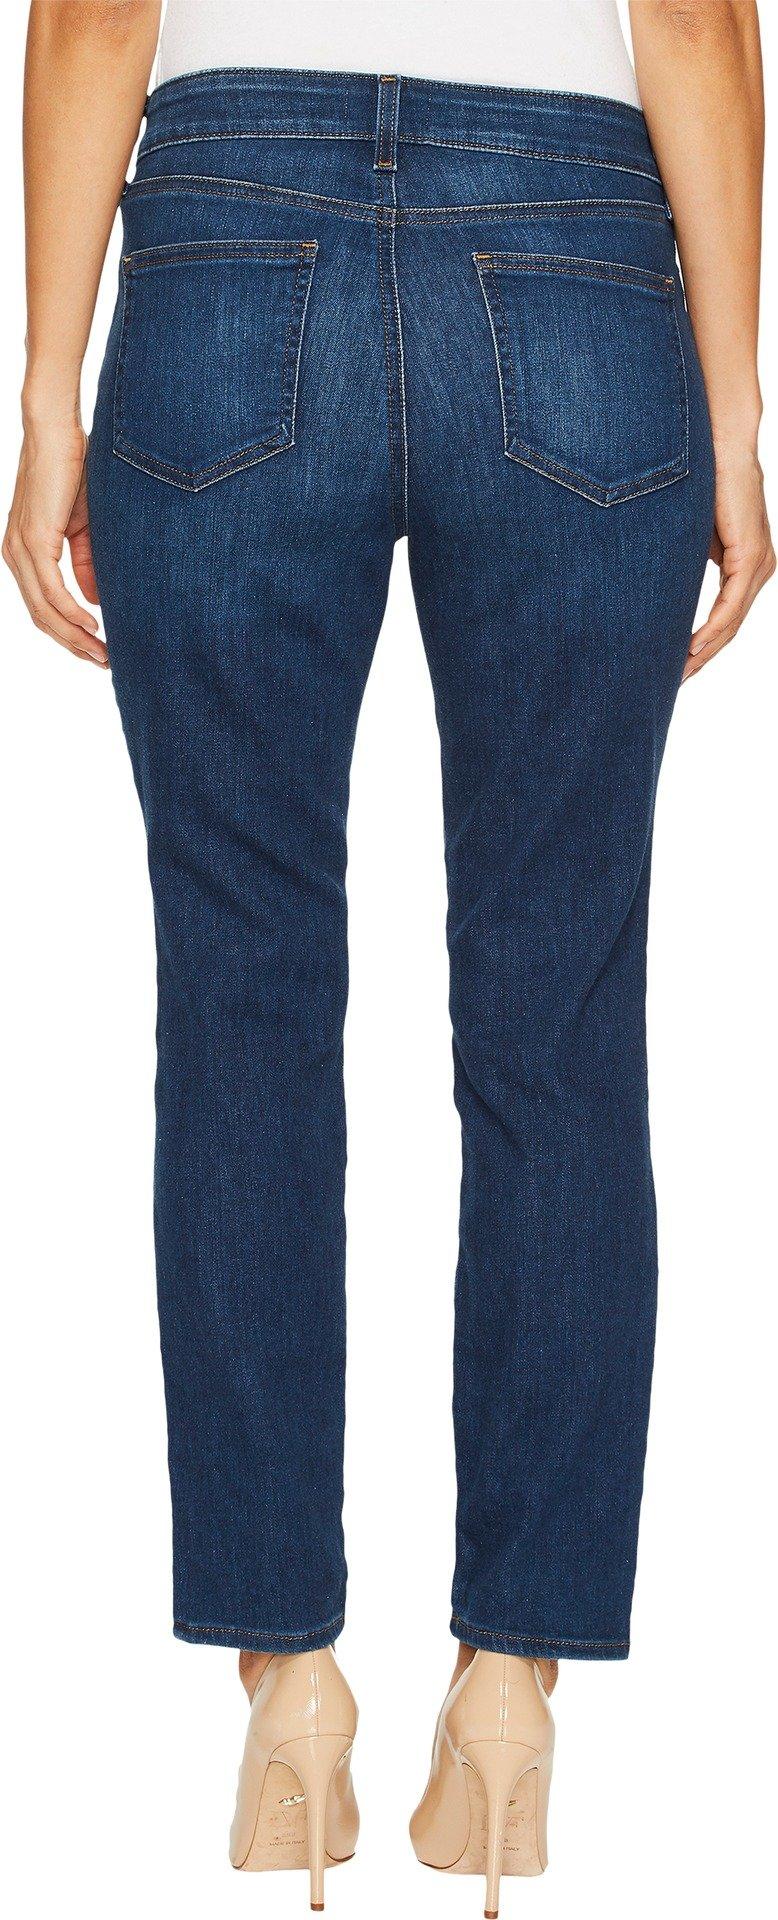 NYDJ Women's Petite Size Alina Legging Jeans, cooper, 12P by NYDJ (Image #2)